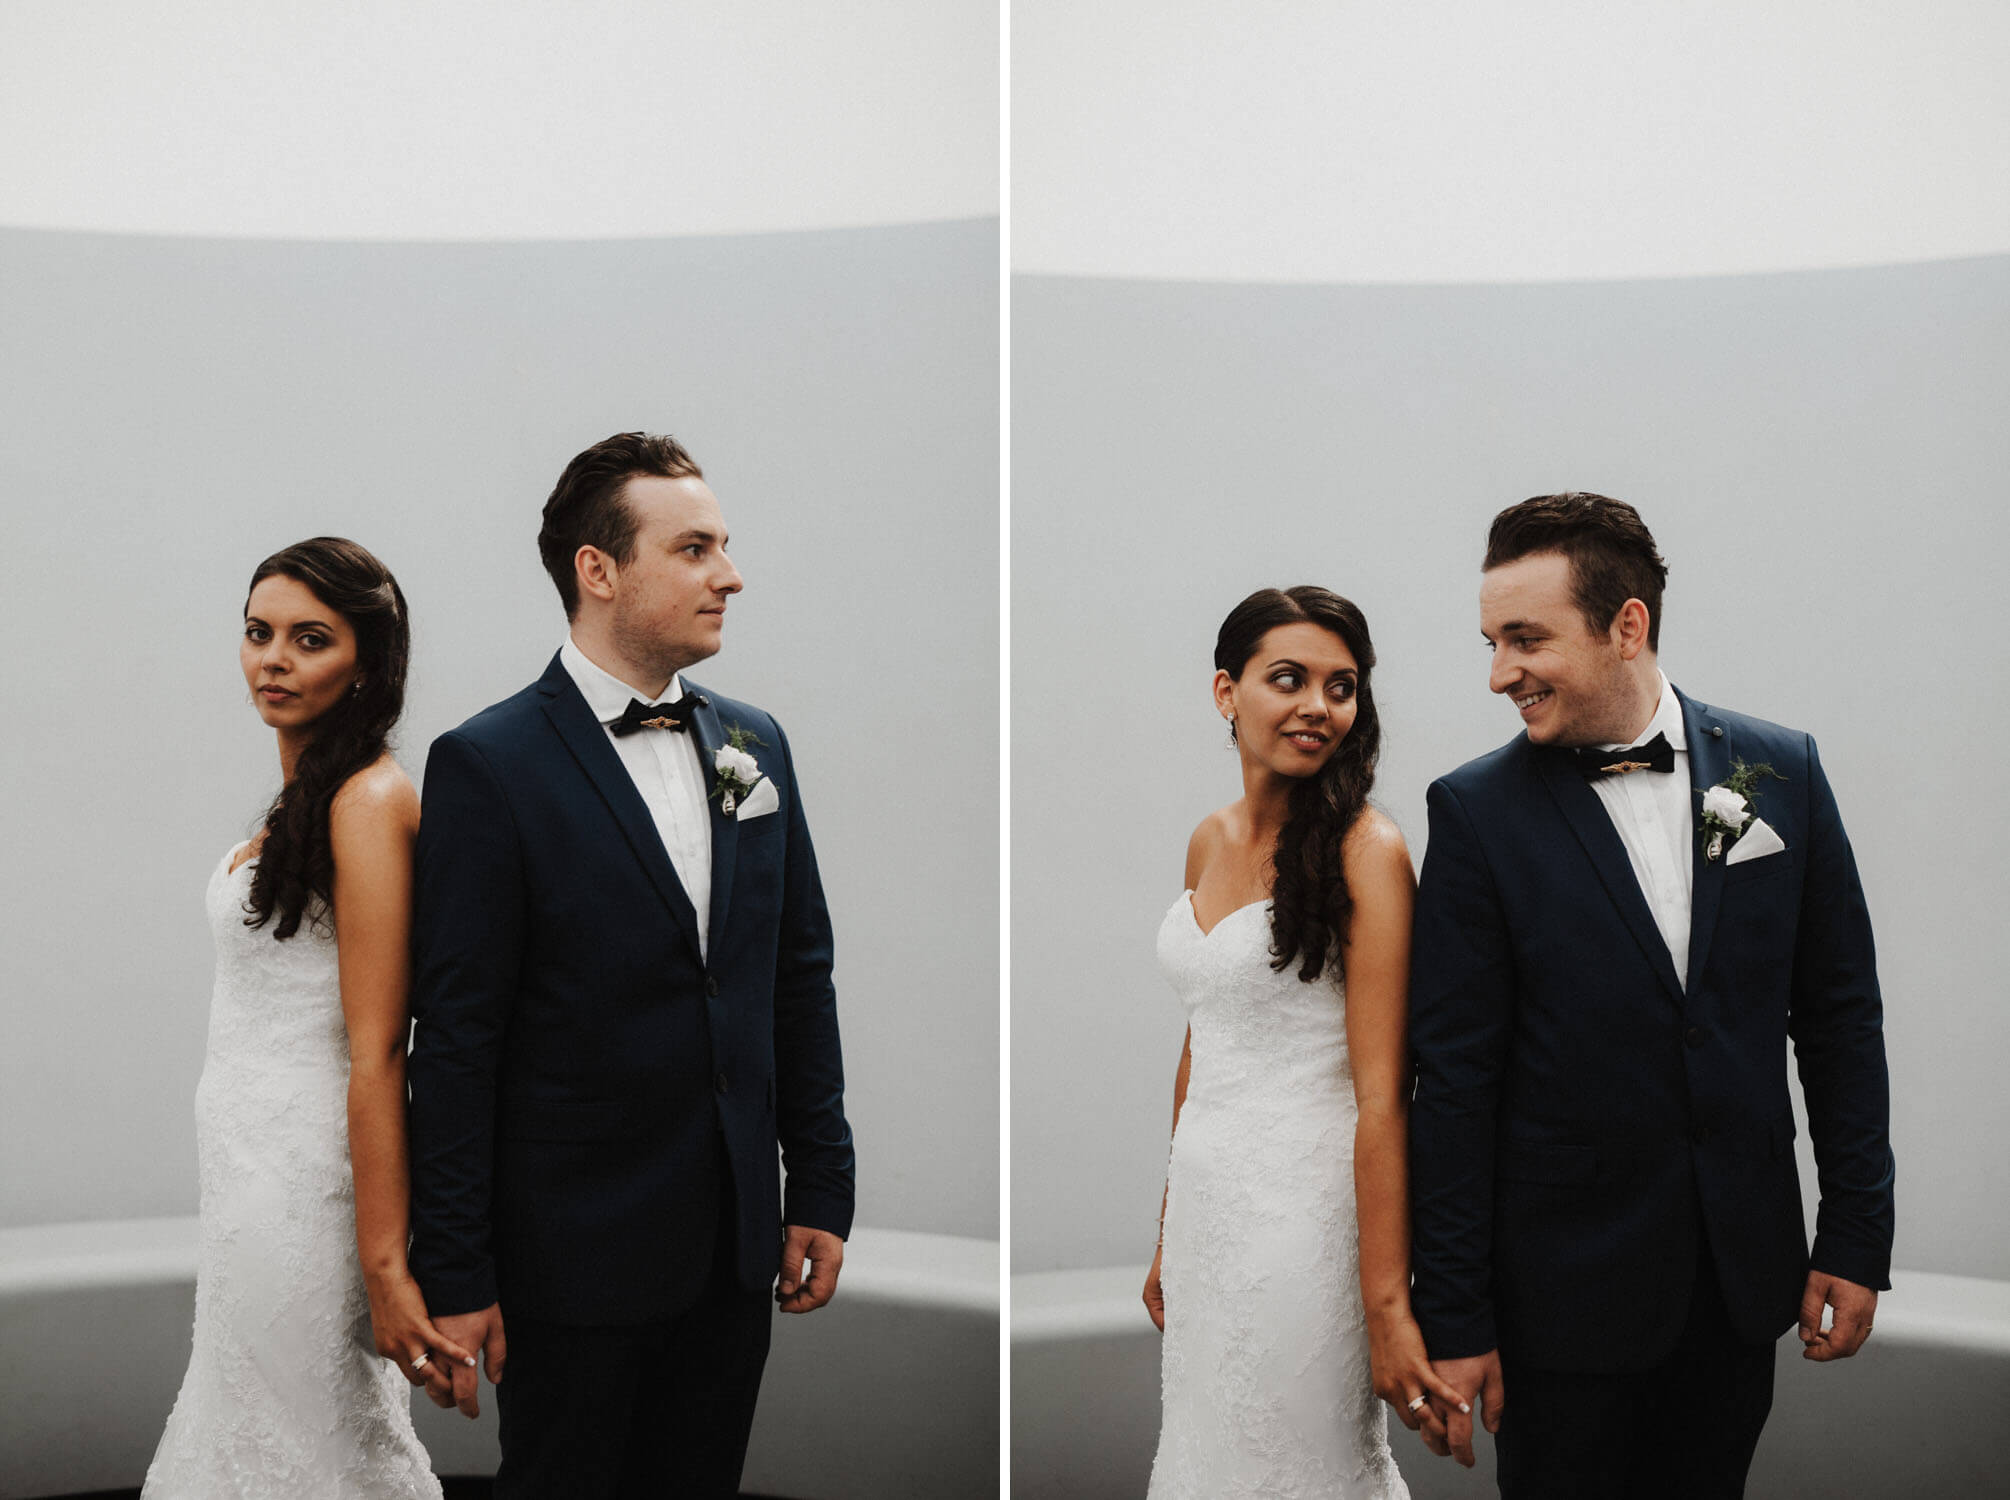 wedding-national-gallery-australia-121(6358)2.jpg